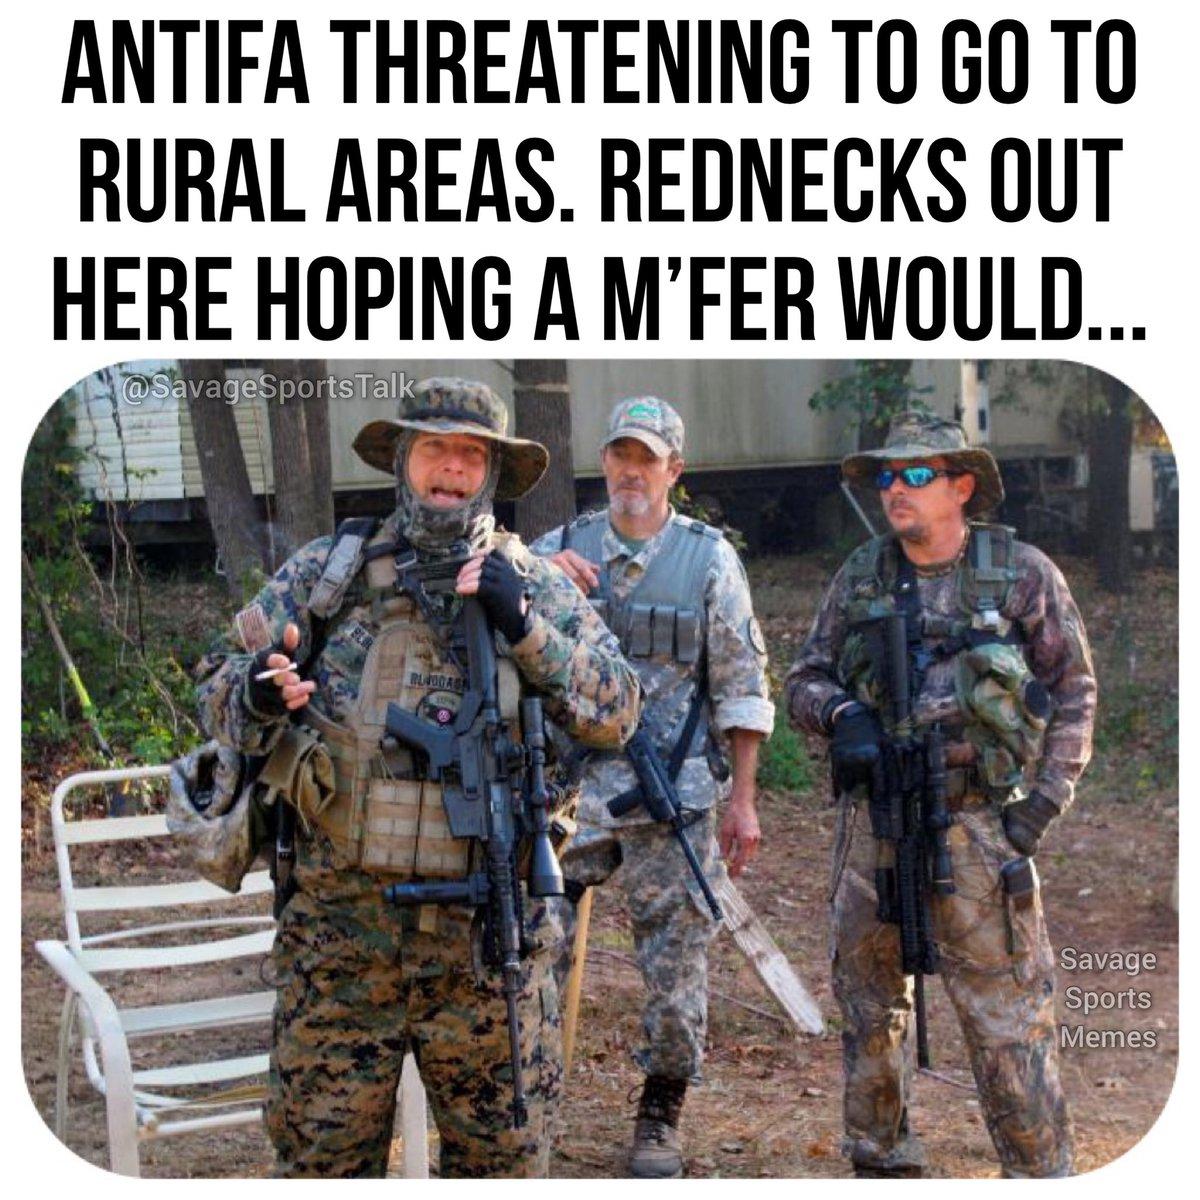 Because hunting is a sport too... . .  #meme #memes #rednecks #antifa #farmer #farmers #sports #sportsmemes #sportsmeme #guns #gun #redneck #riots #riots2020